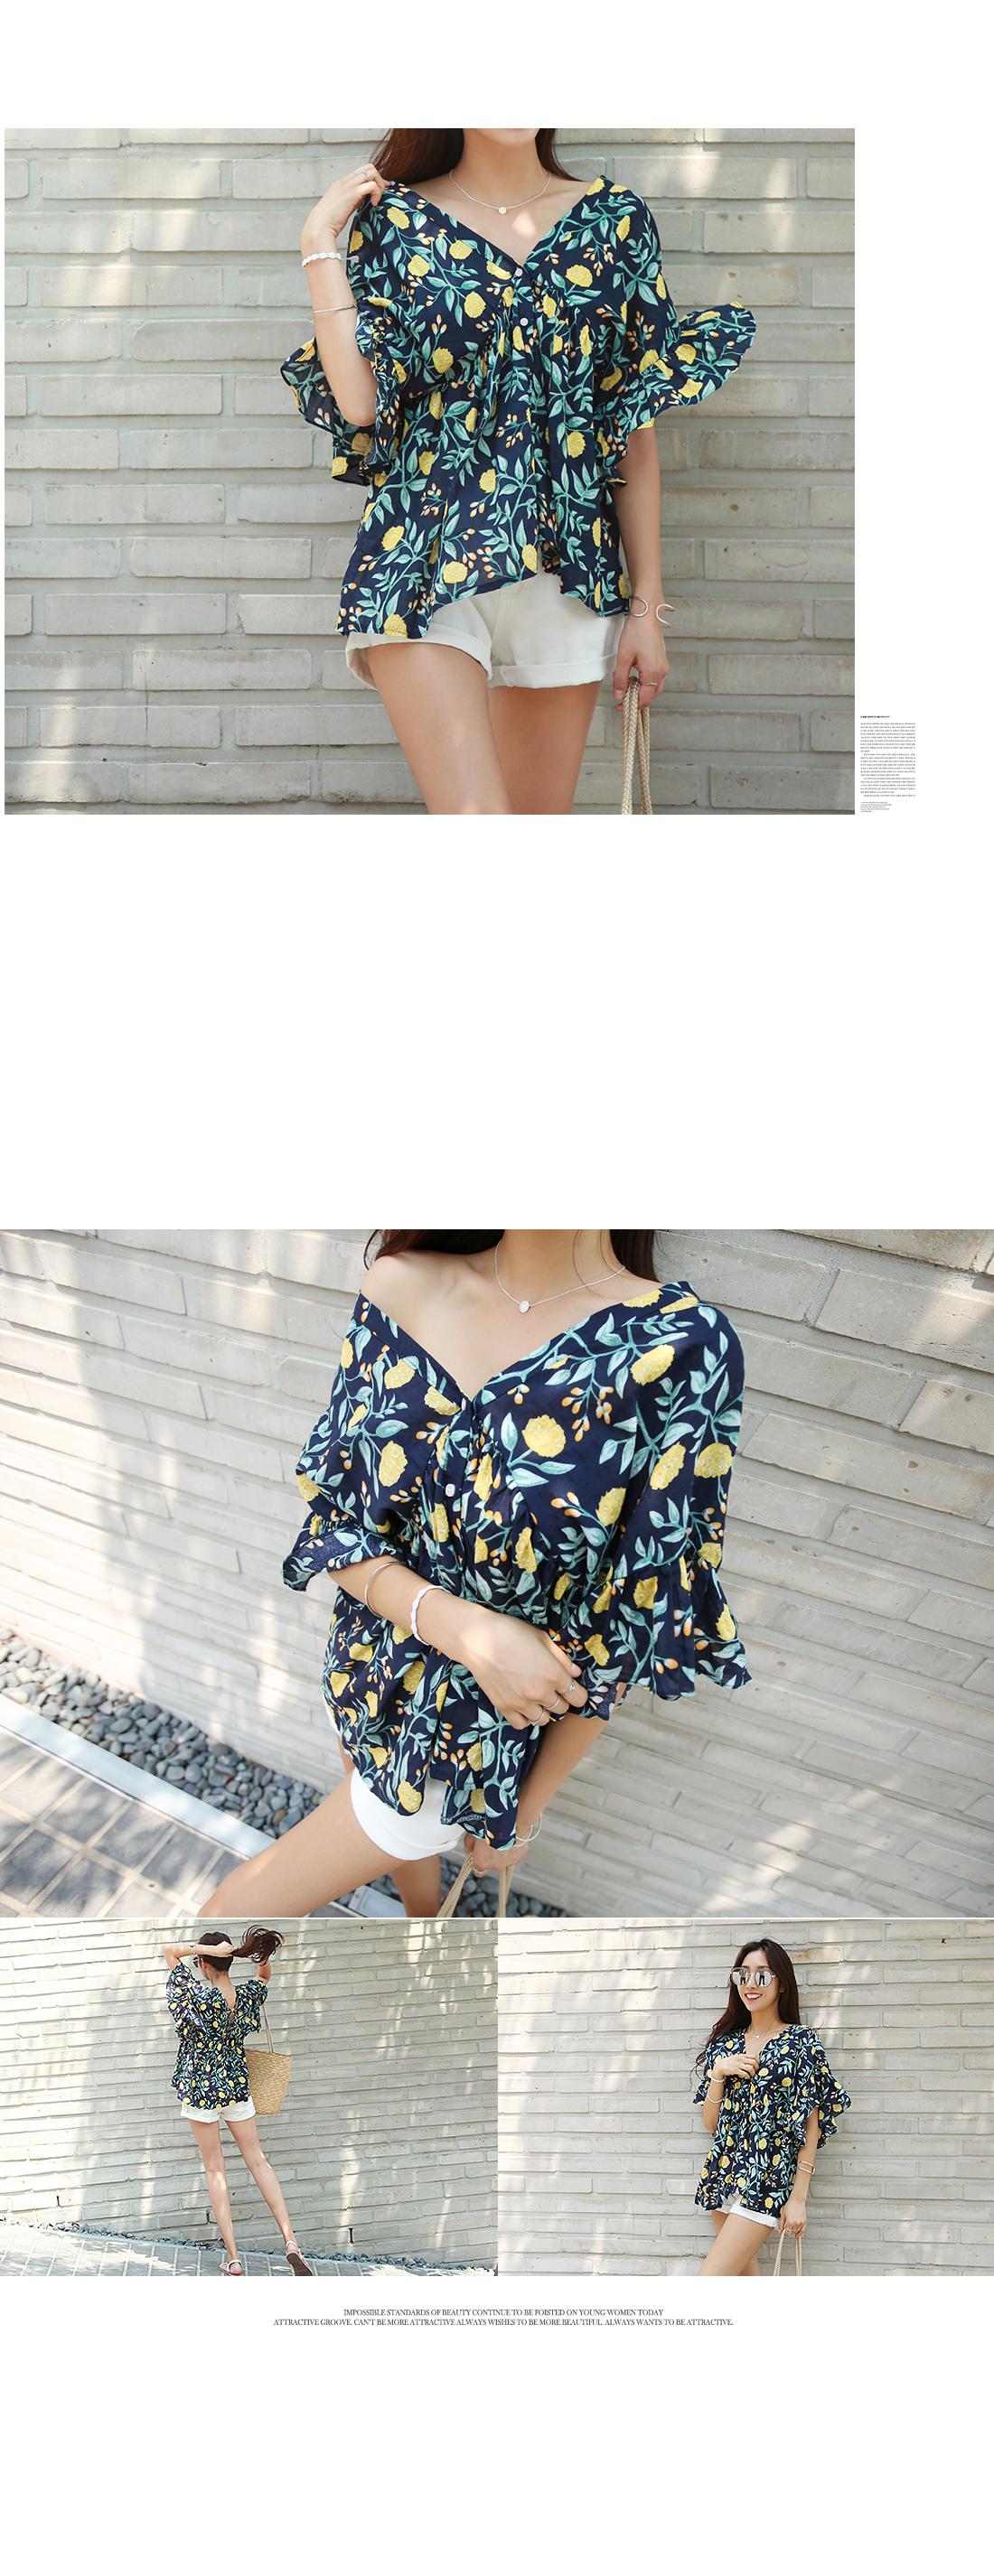 Taylor backline strap blouse #44156